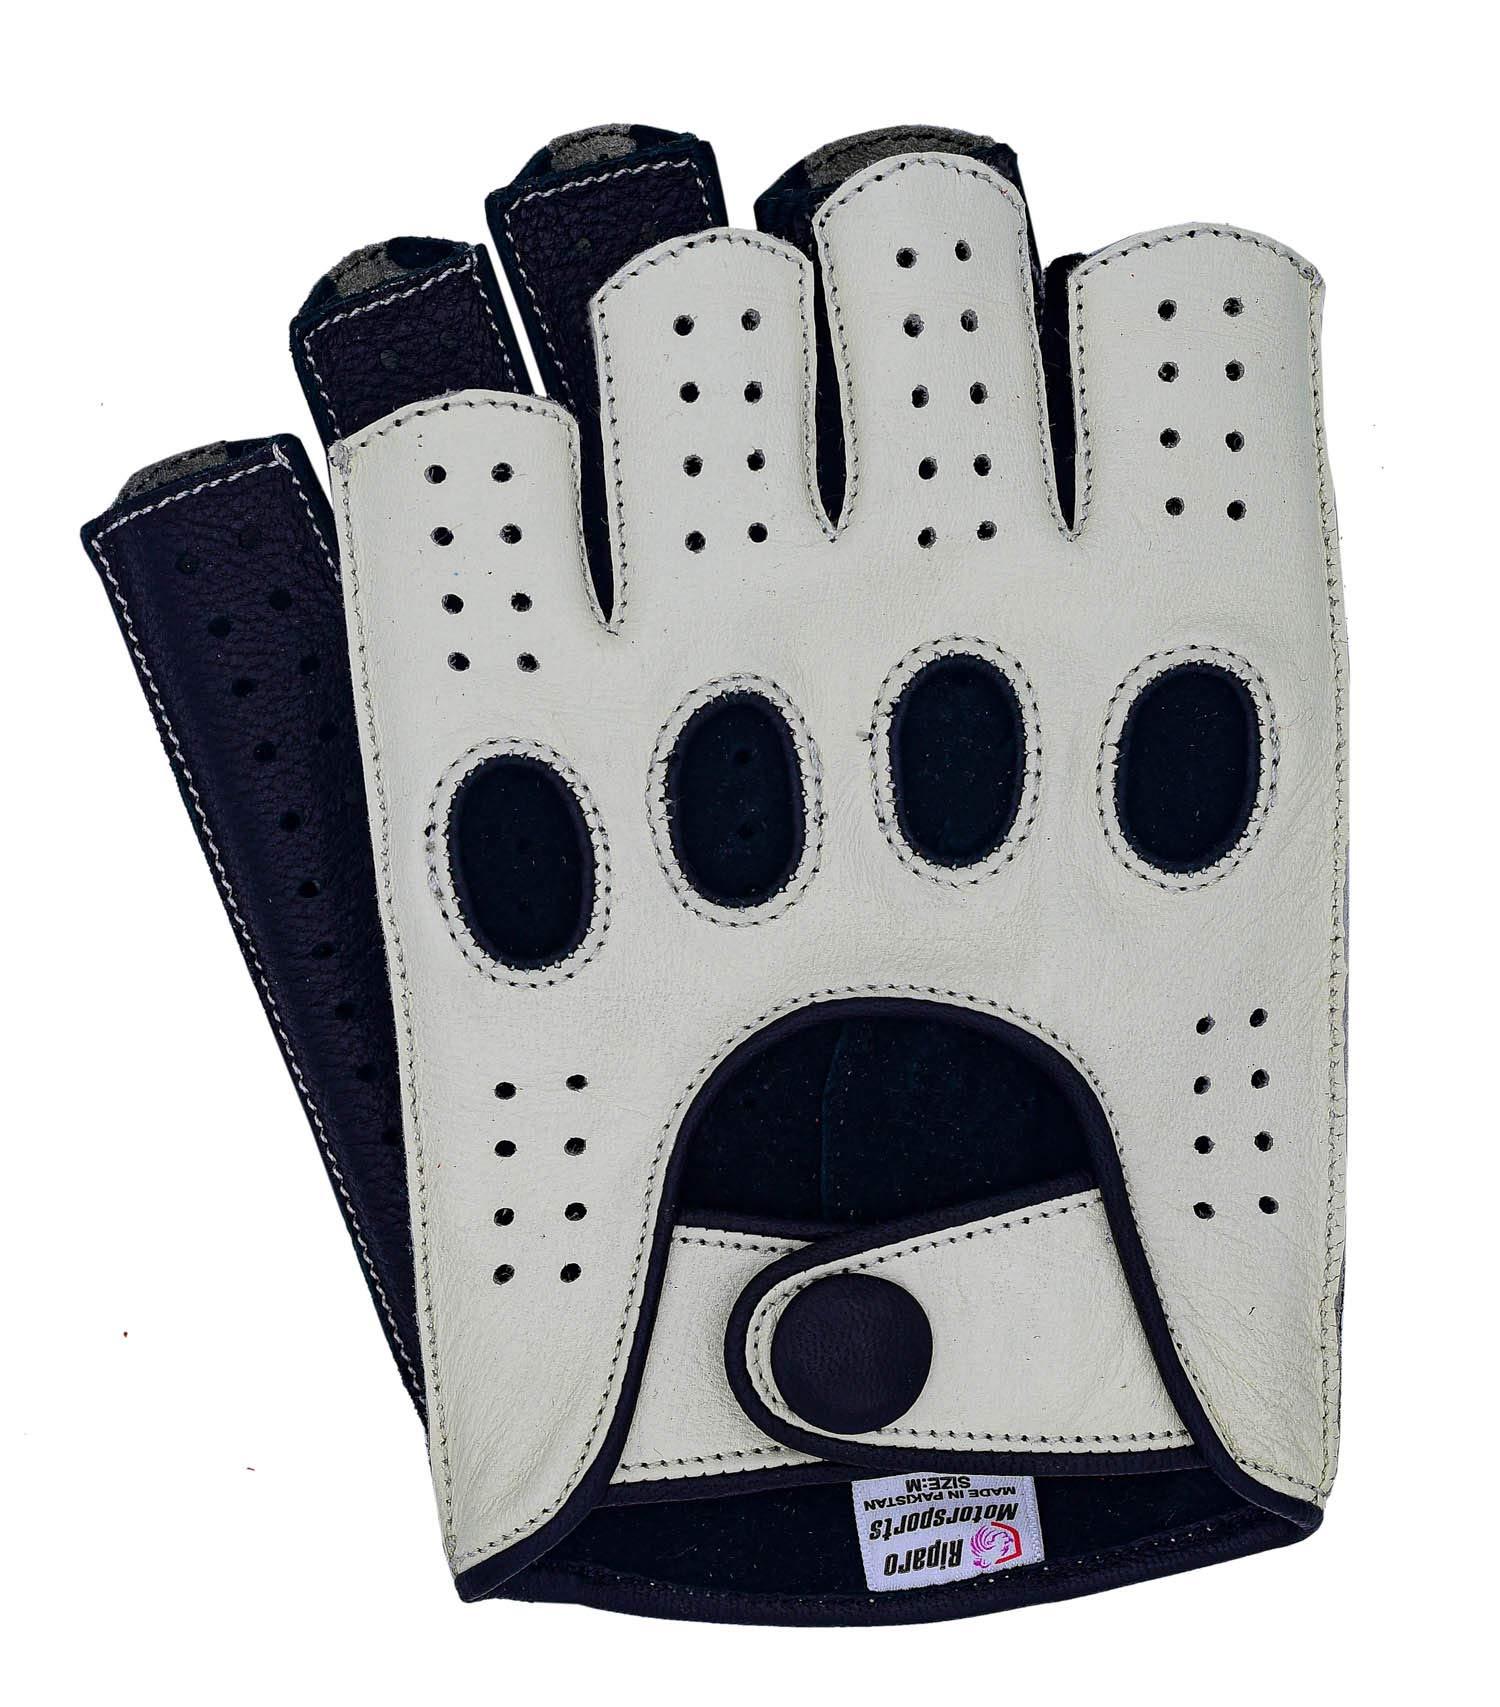 Riparo Women Genuine Leather Reverse Stitched Half-Finger Fingerless Driving Motorcycle Gloves (7, White/Black)